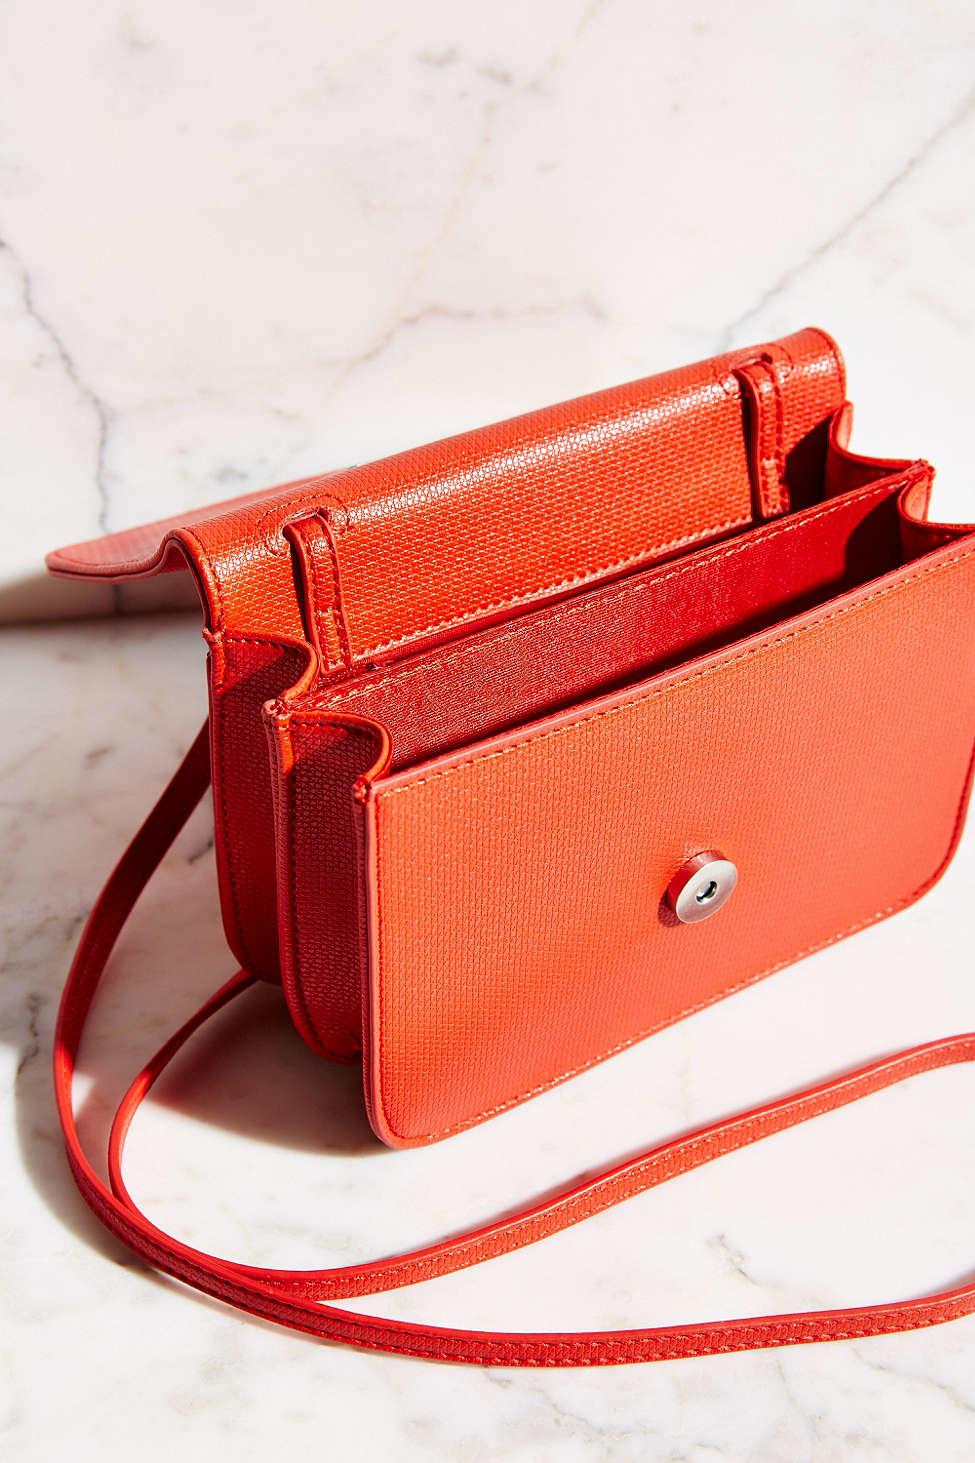 ecf3b573085e9 Lyst - Silence + Noise Mini Textured Crossbody Bag in Orange